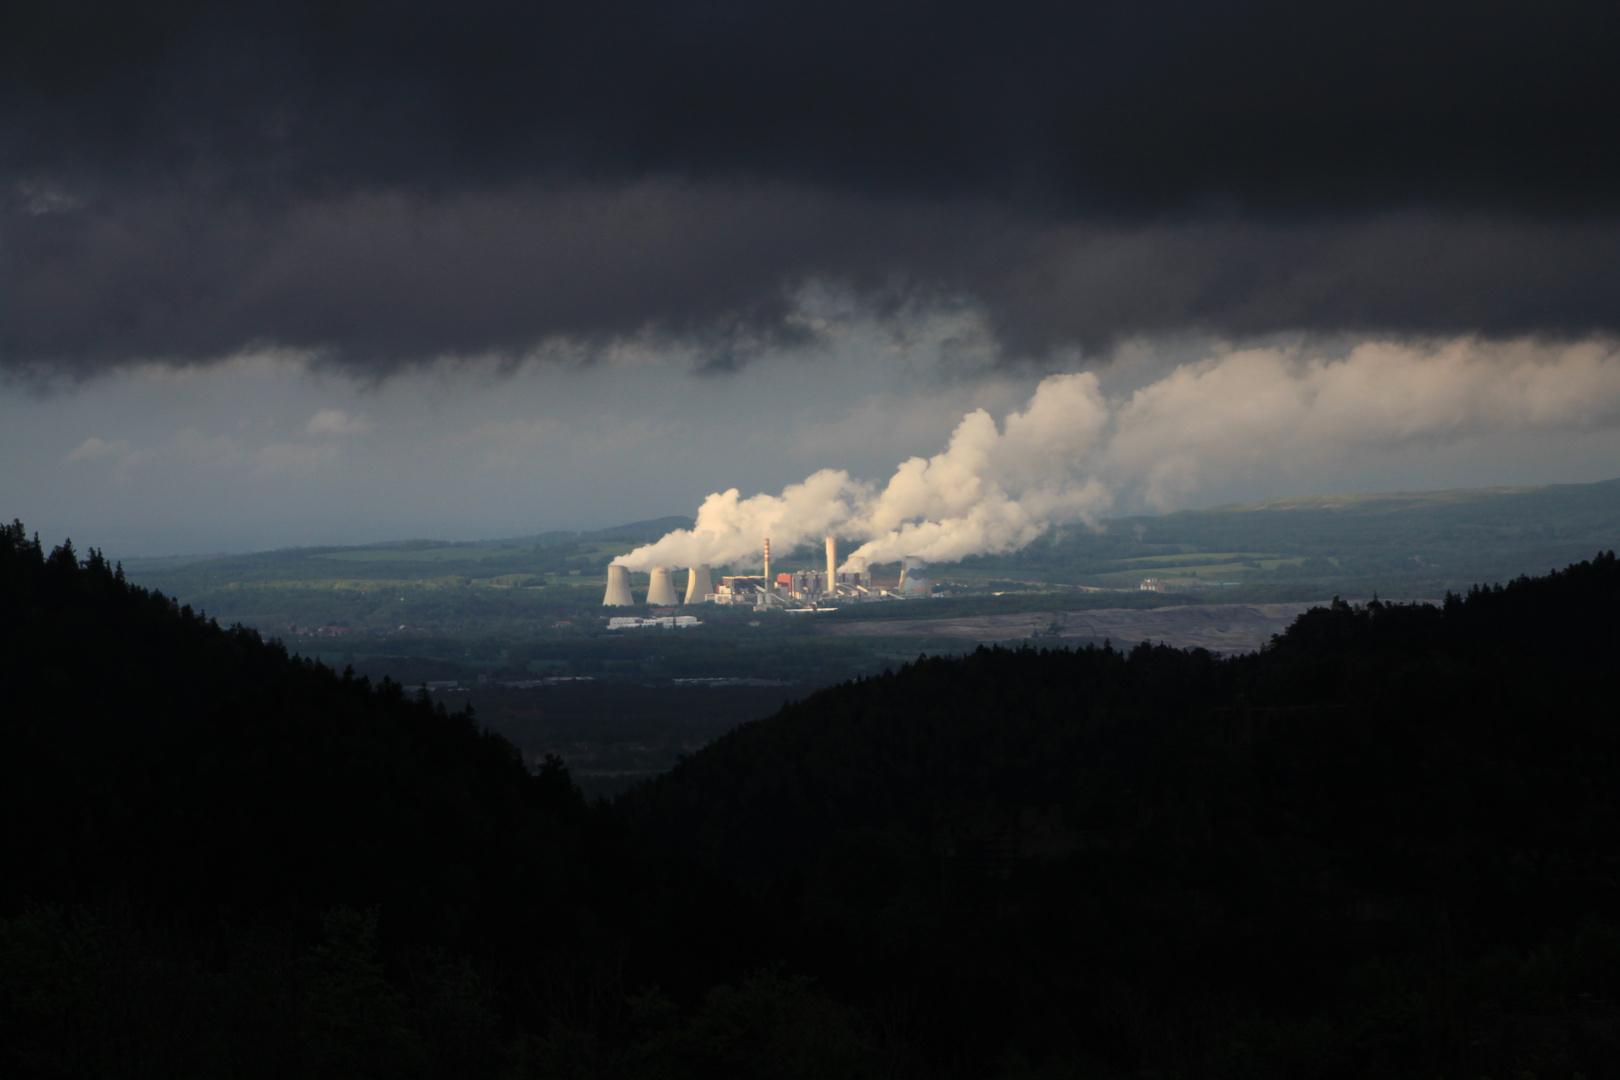 Kohlekraftwerk Oberlausitz